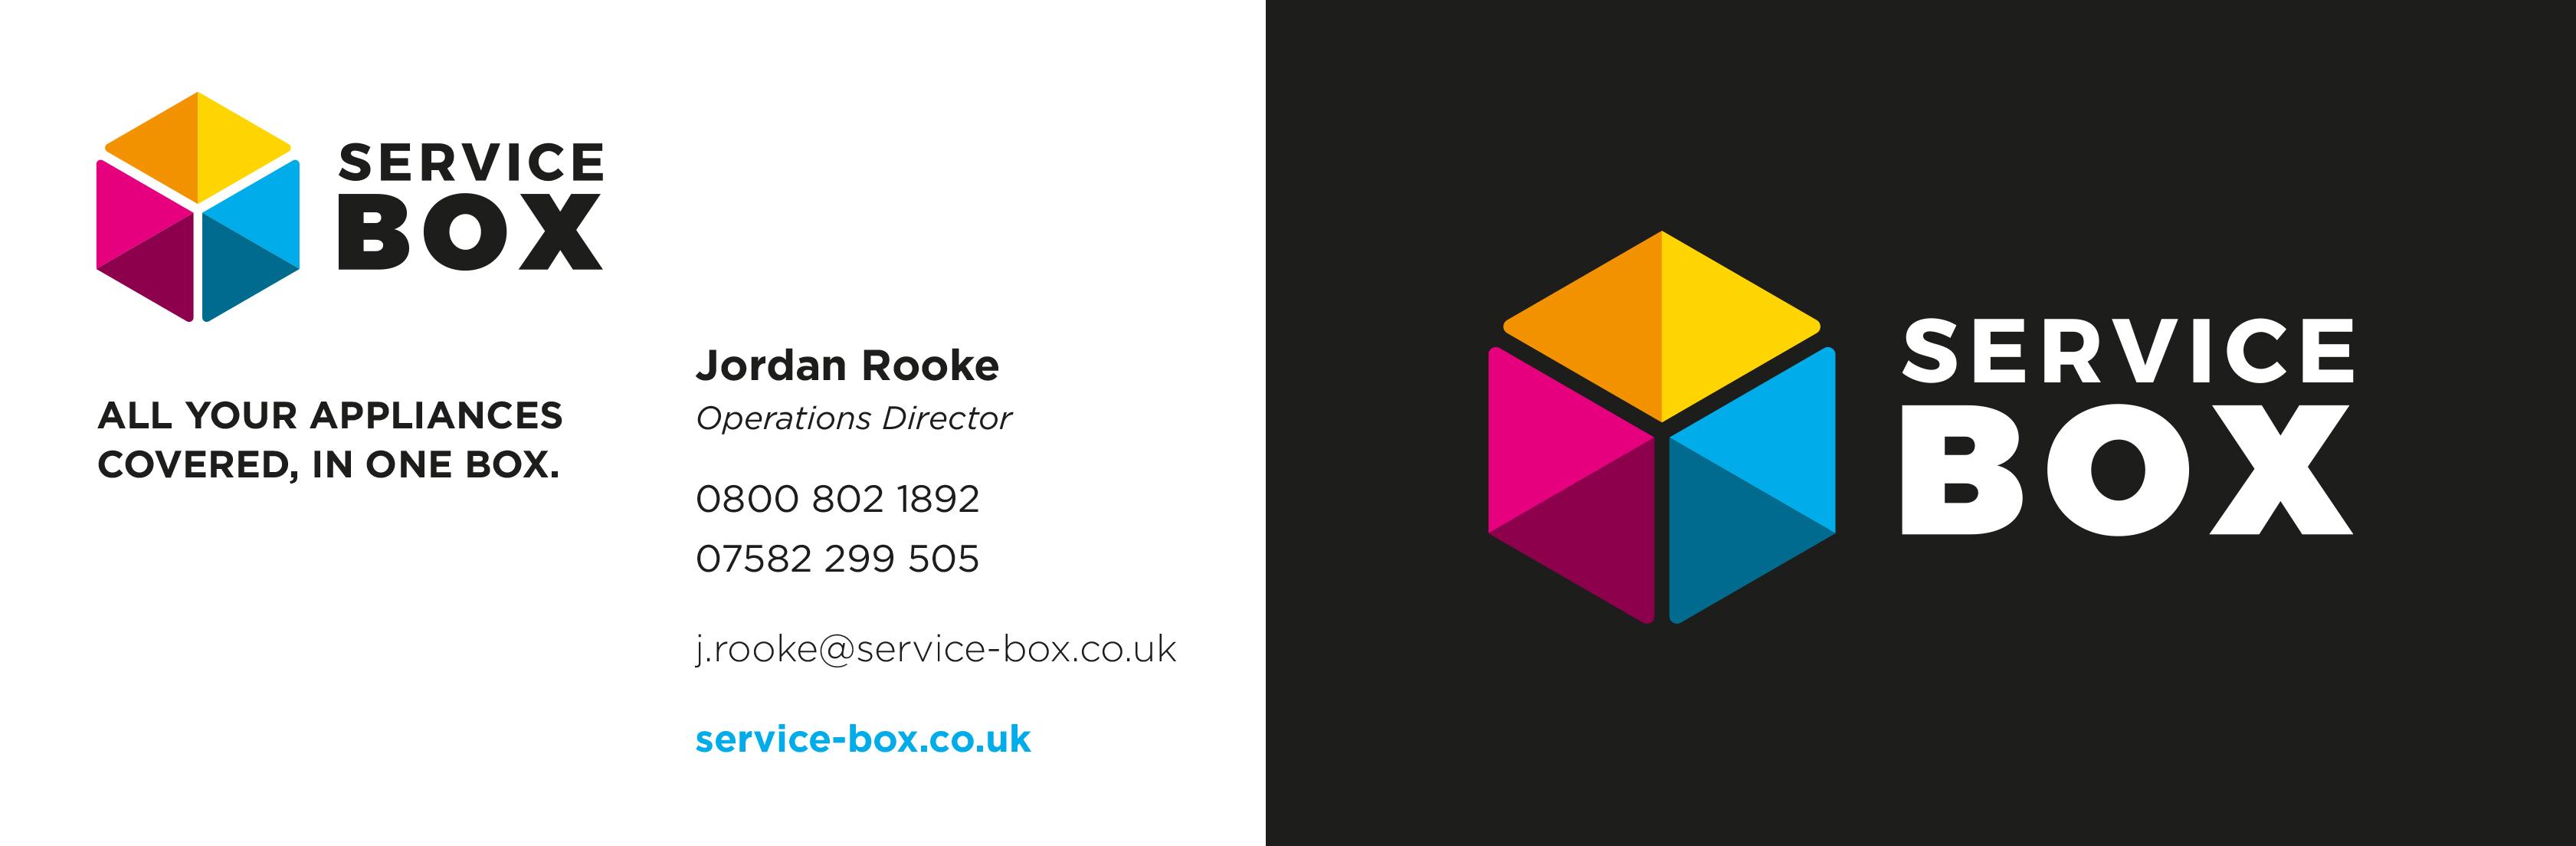 Service Box logo design